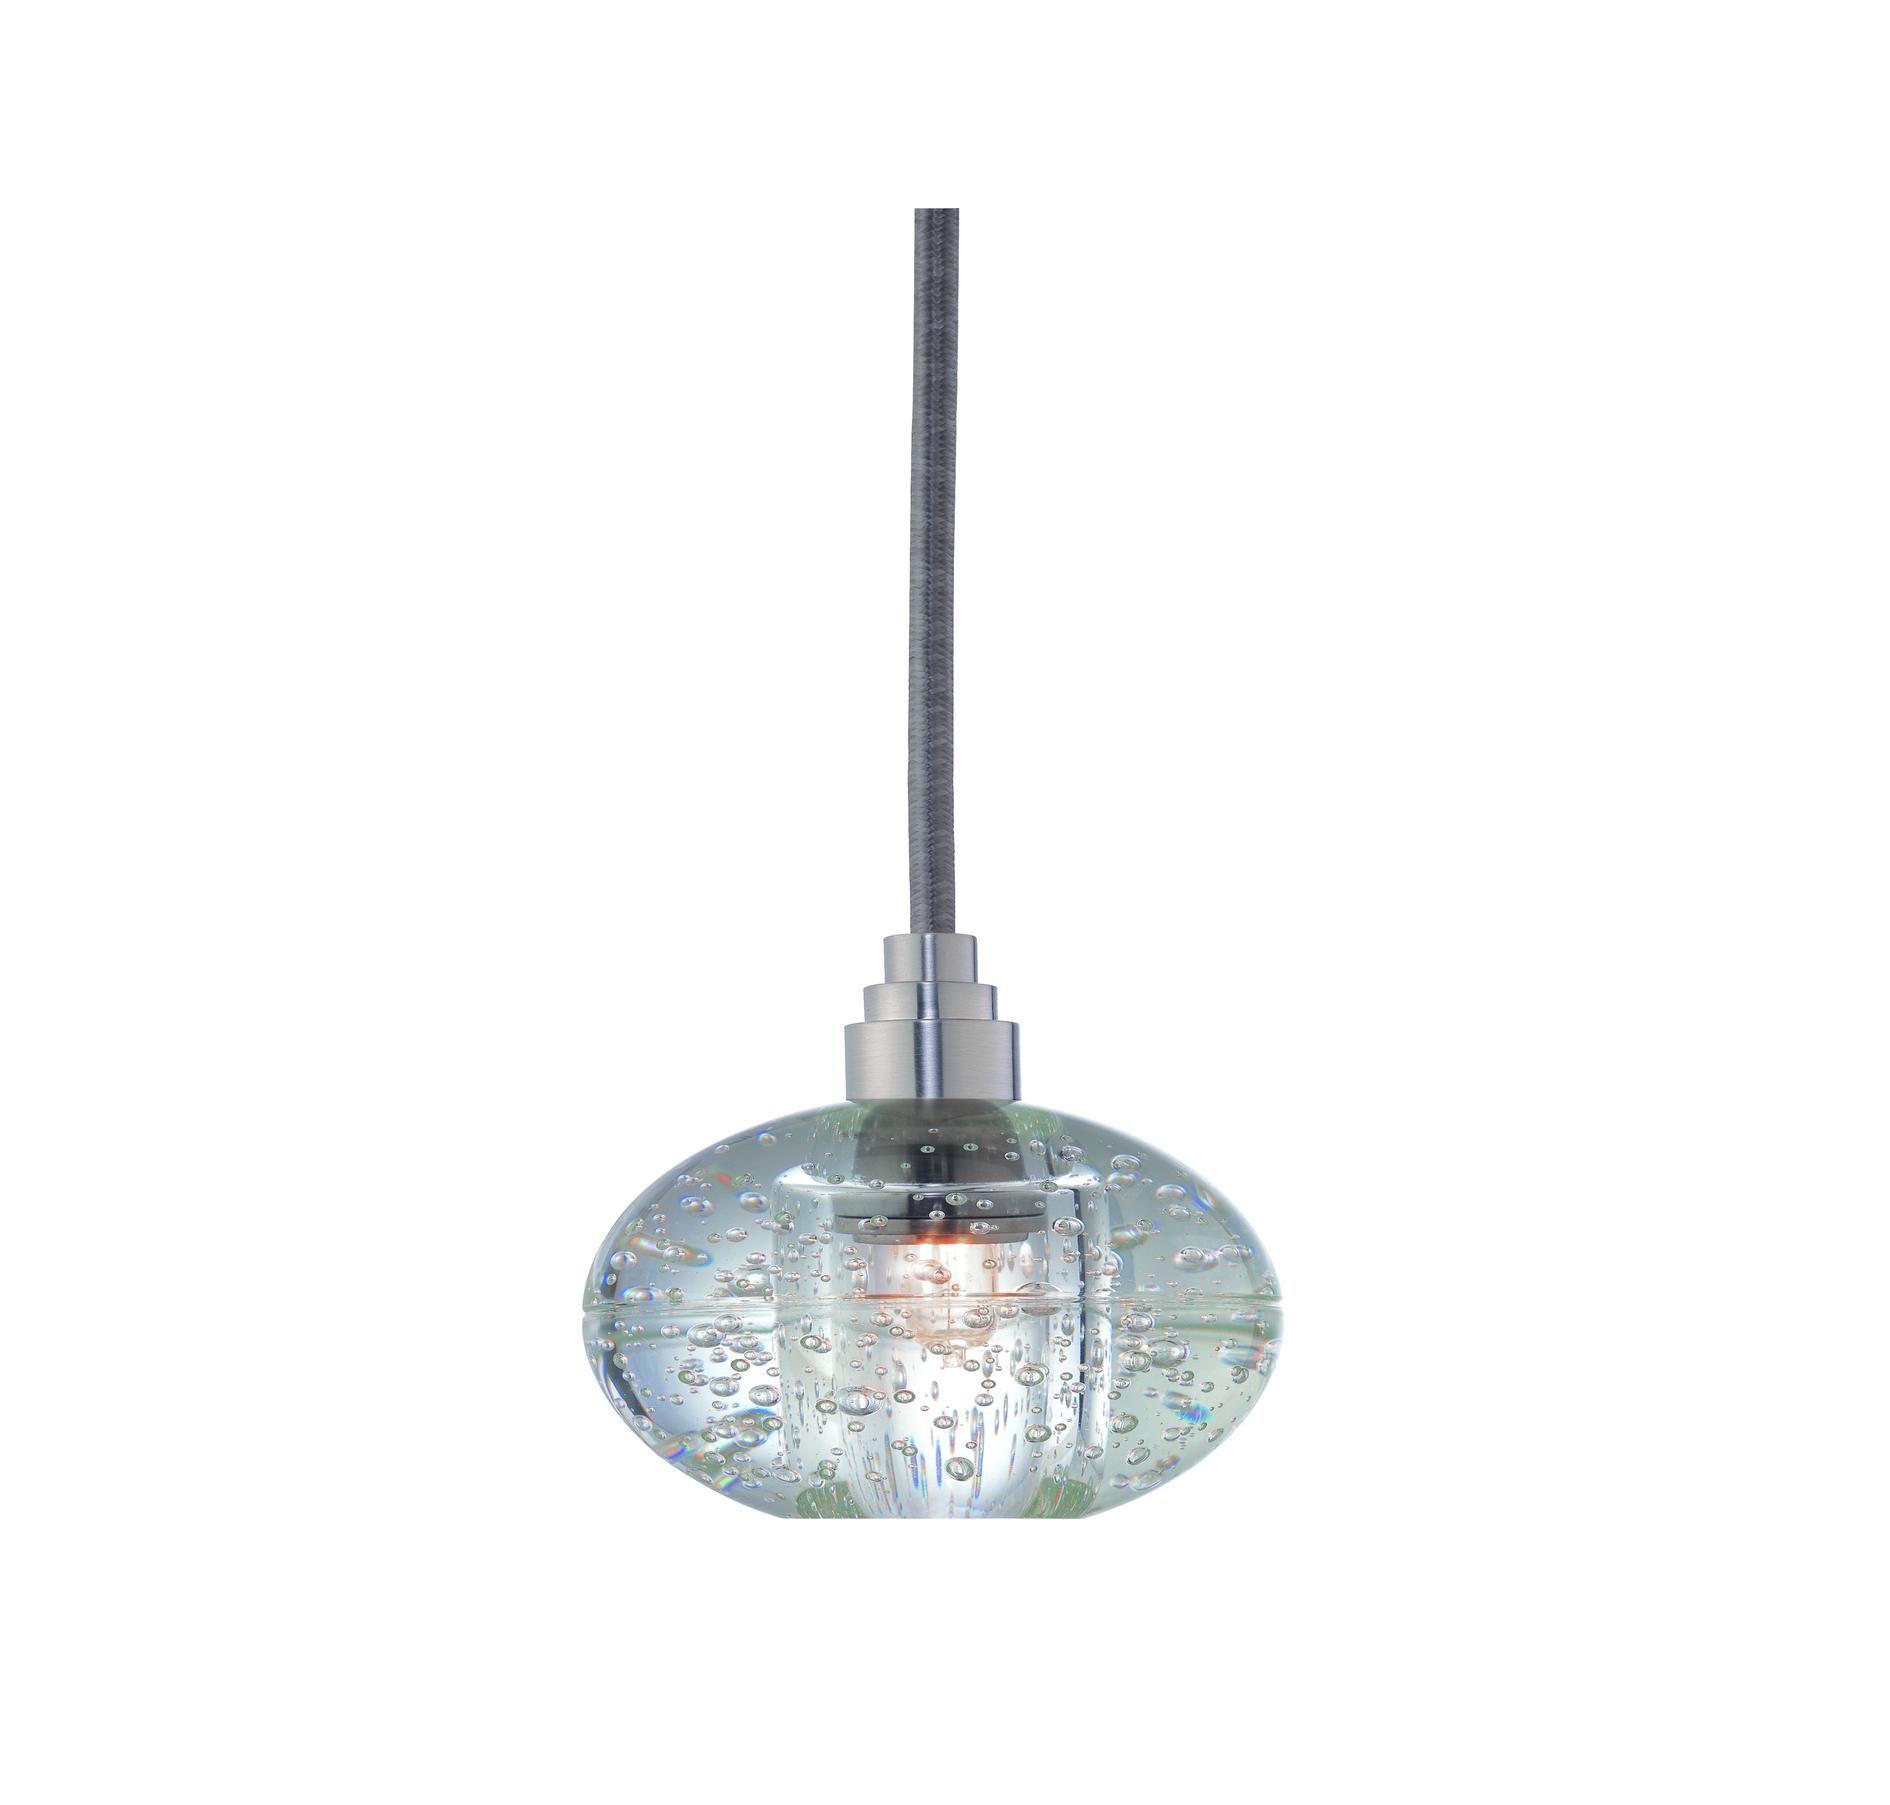 Hudson Valley 3506-SN-S-001 Naples Glass Nickel Pendant in Nickel in Ceiling Lights, Pendants, Ceiling Pendants: LightsOnline.com